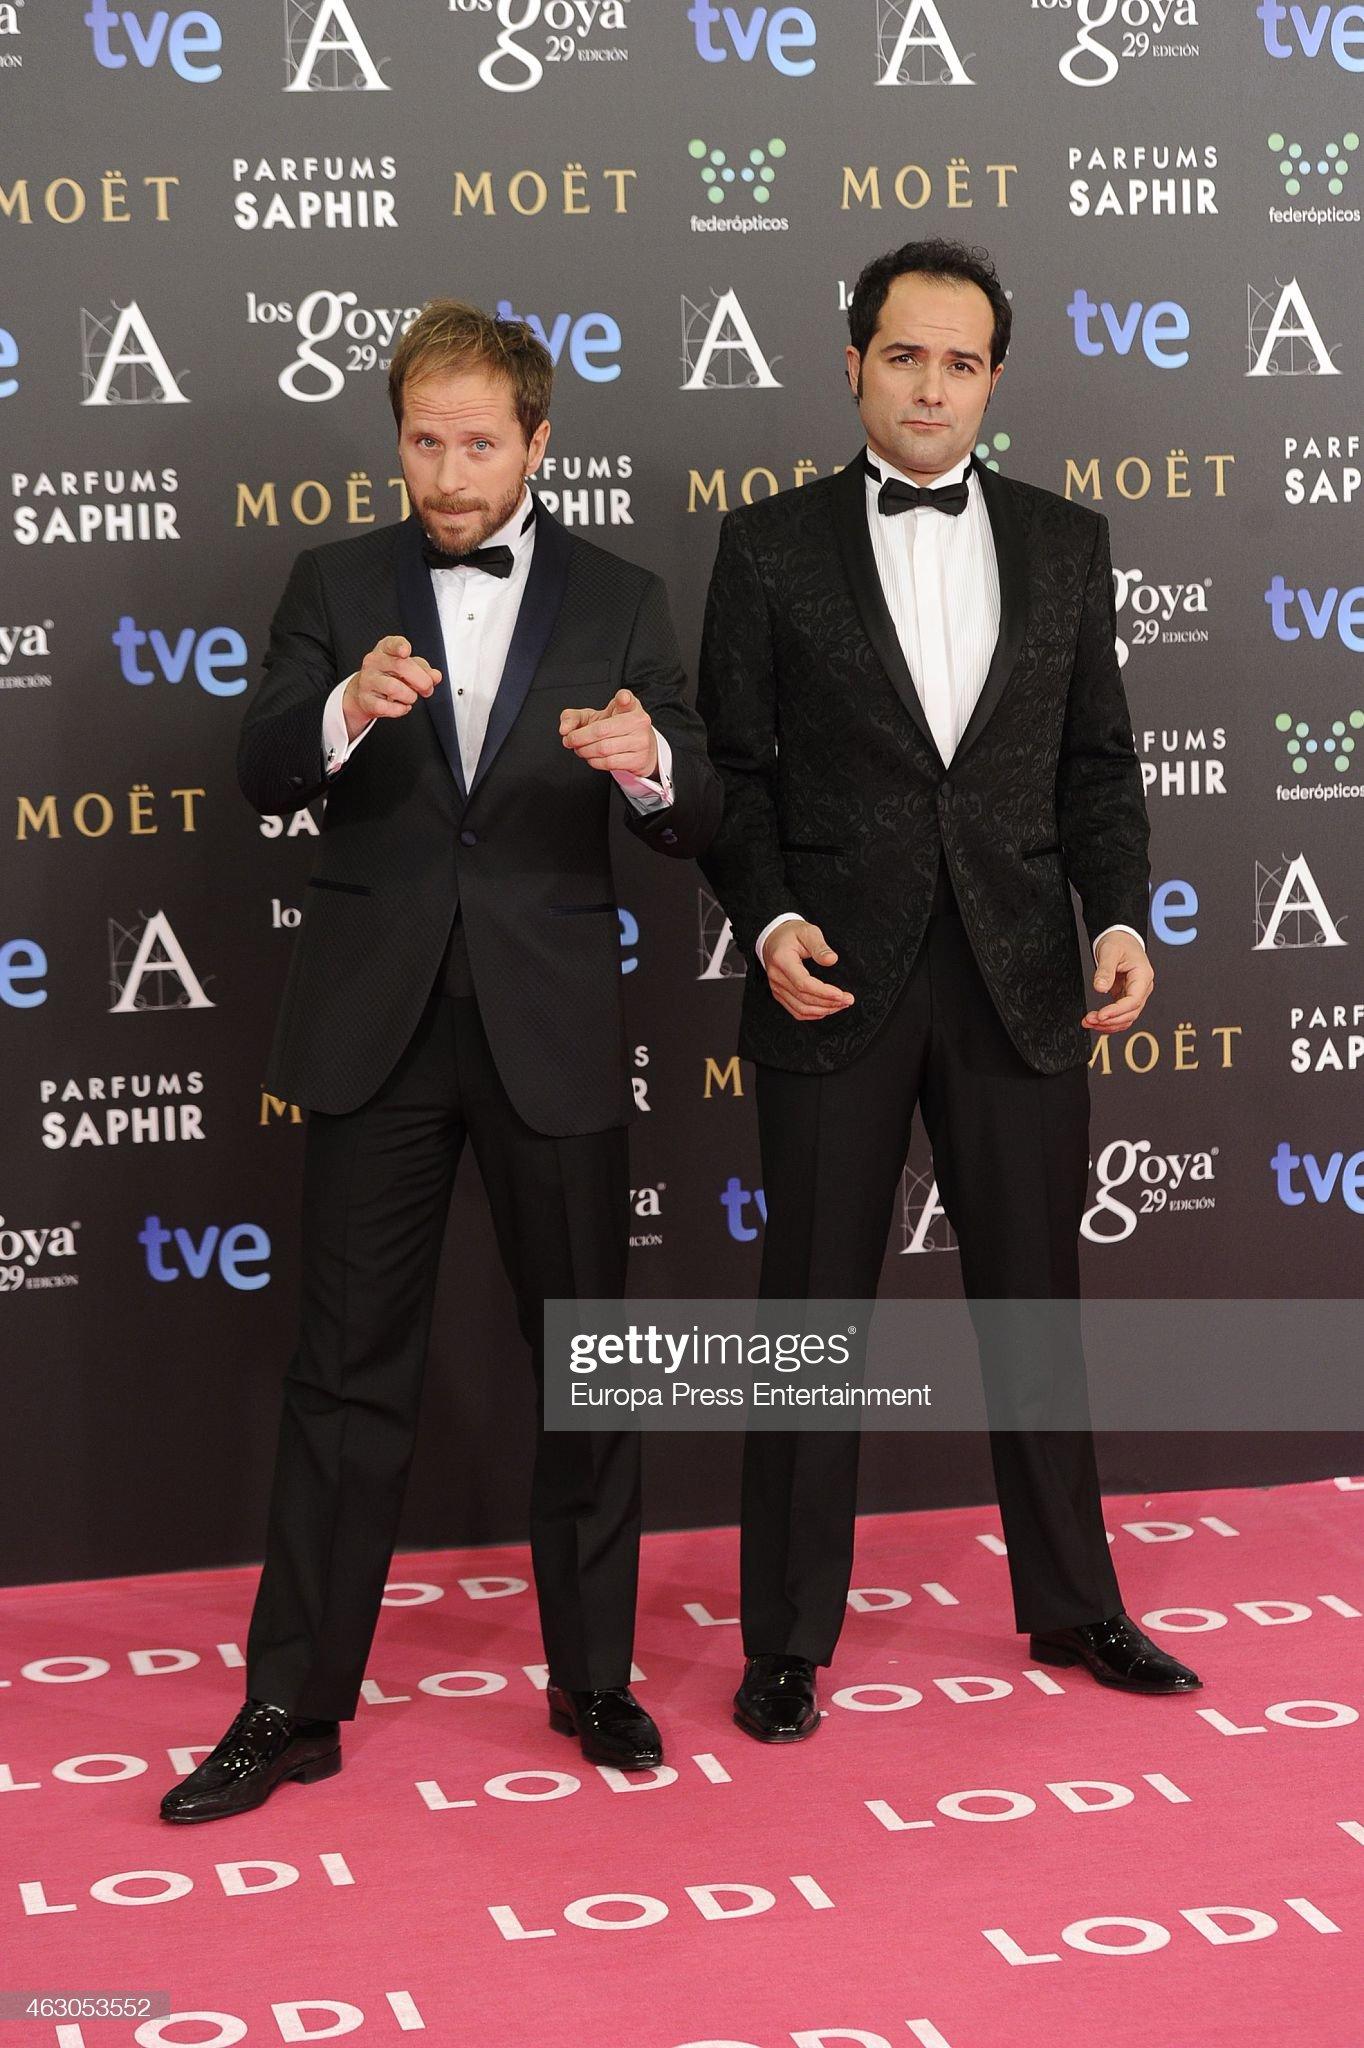 ¿Cuánto mide Alfonso Sánchez? - Altura Alfonso-sanchez-and-alberto-lopez-los-compadres-attend-goya-cinema-picture-id463053552?s=2048x2048